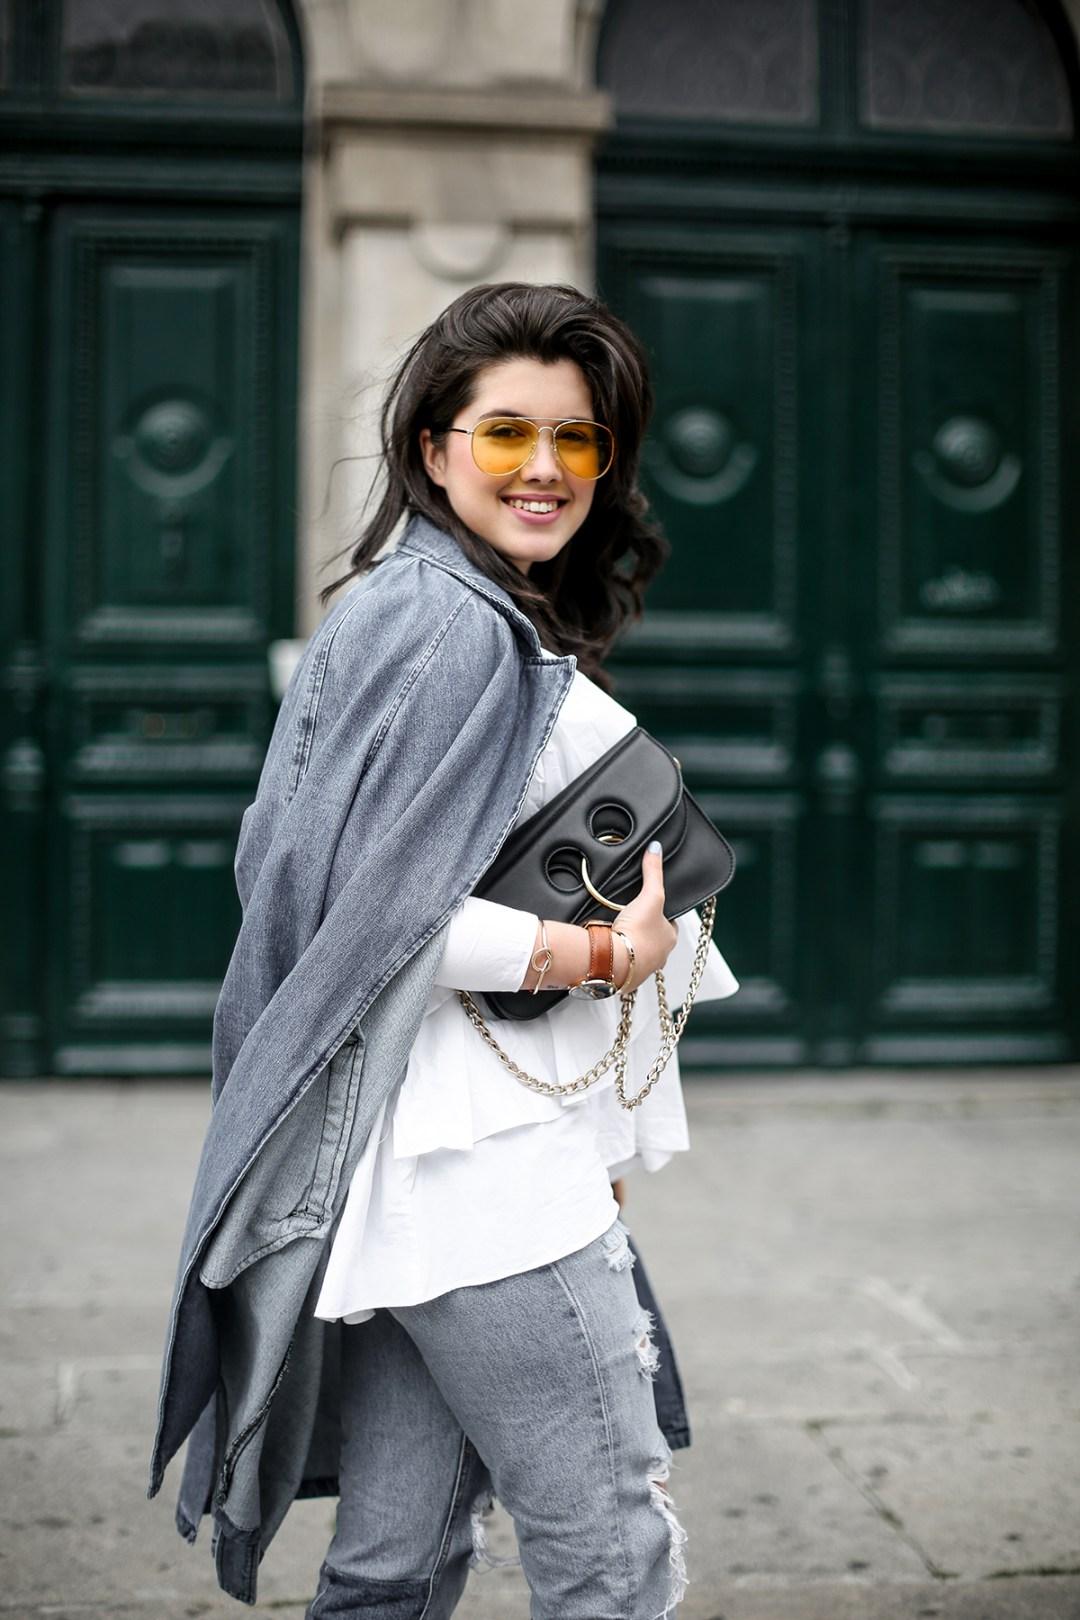 trench-denim-ripped-jeans-ruffle-blouse-zara-streetstyle3